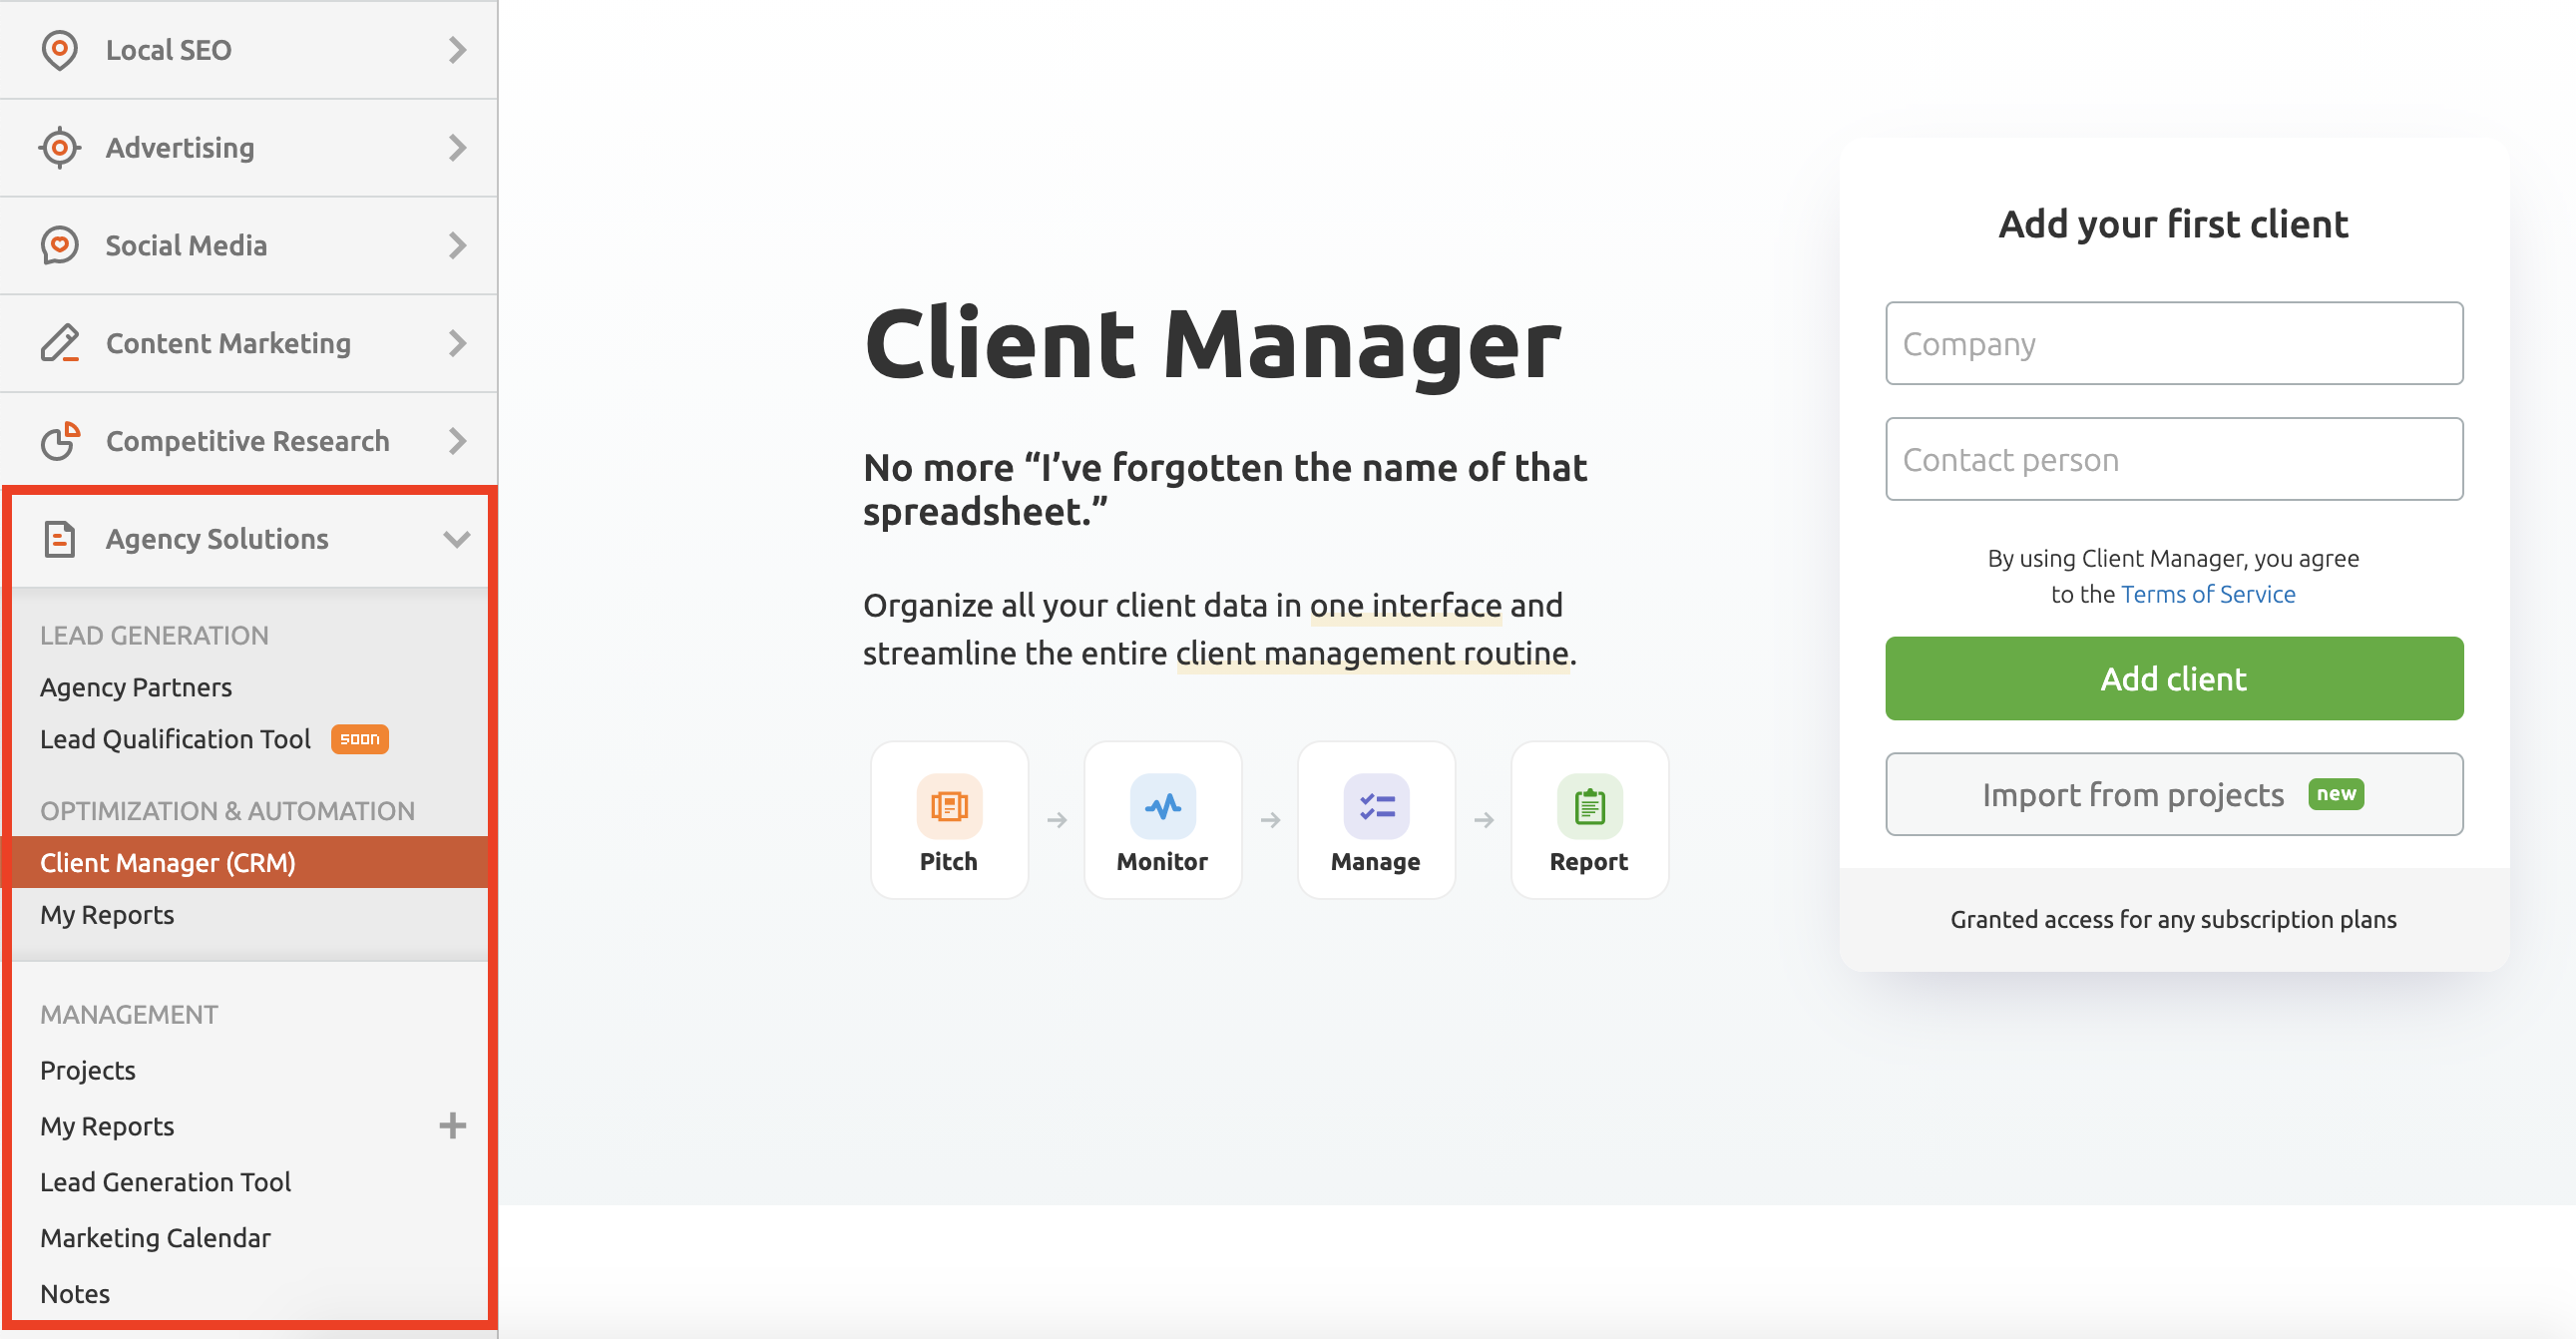 Management image 1